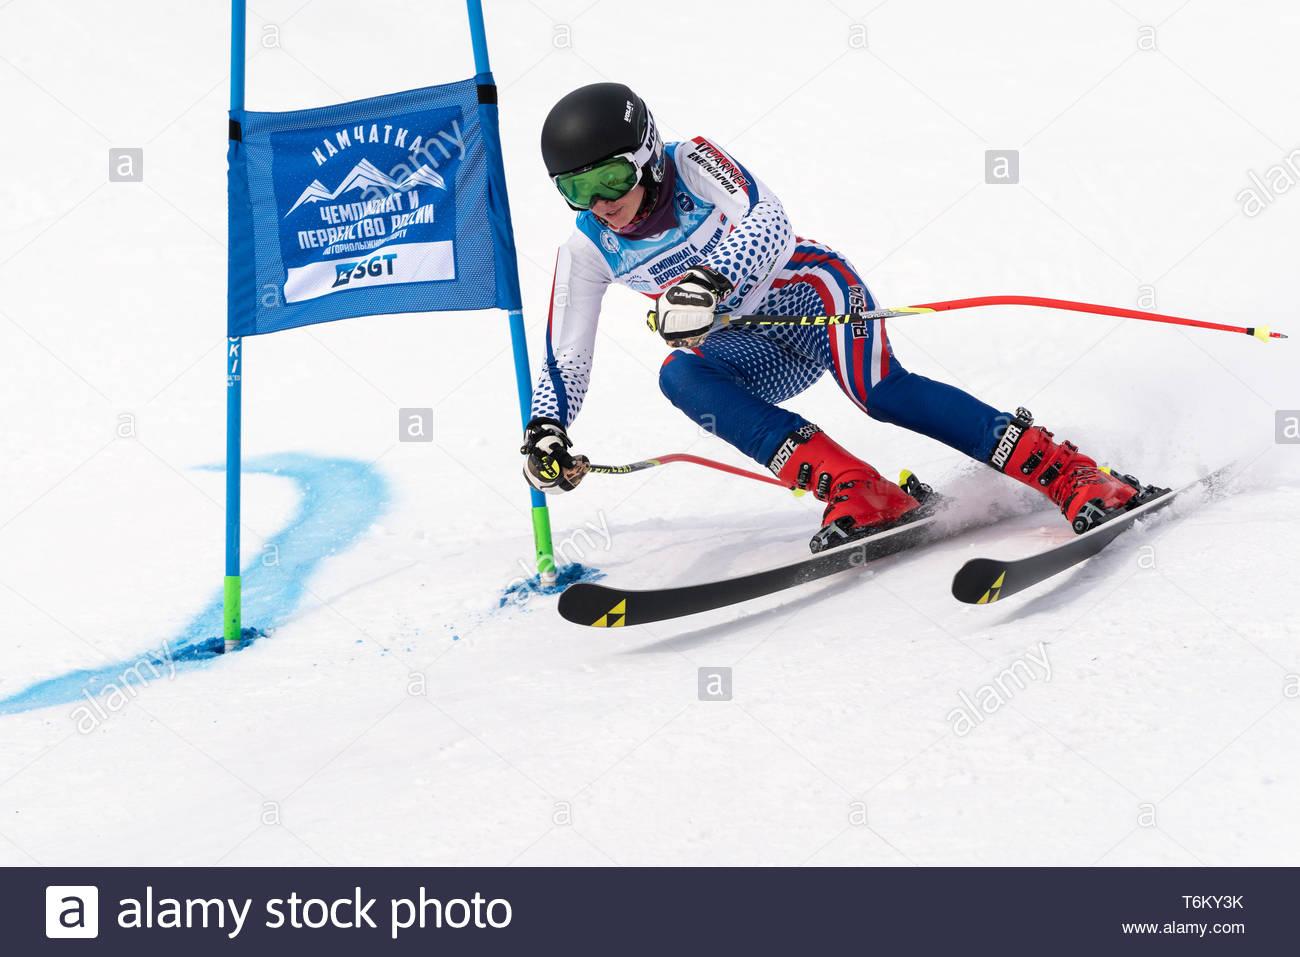 KAMCHATKA, RUSSIA - APRIL 2, 2019: Russian Women's Alpine Skiing Cup, International Ski Federation Championship - giant slalom. Mountain skier Martyno - Stock Image